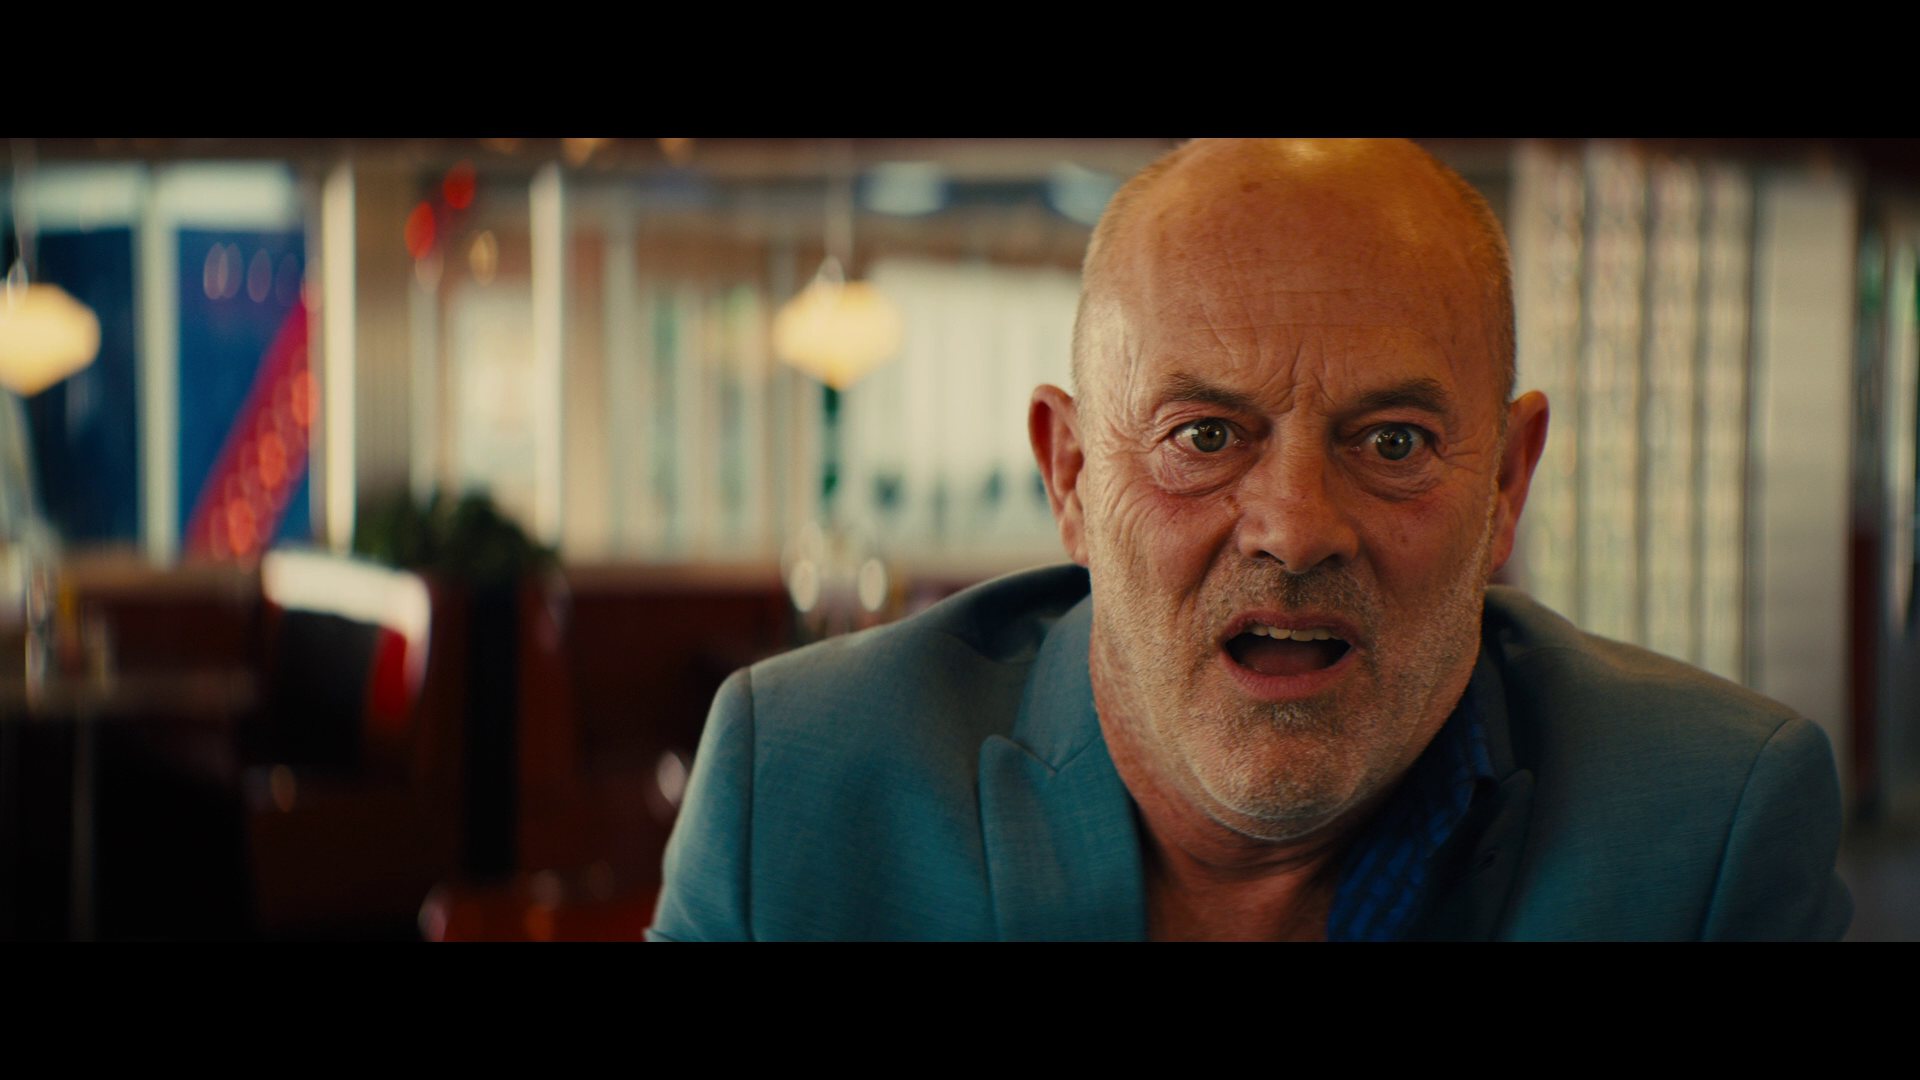 Kingsman The Golden Circle (2017) 1080p Blu-ray AVC DTS-HD MA 7.1-HDChina